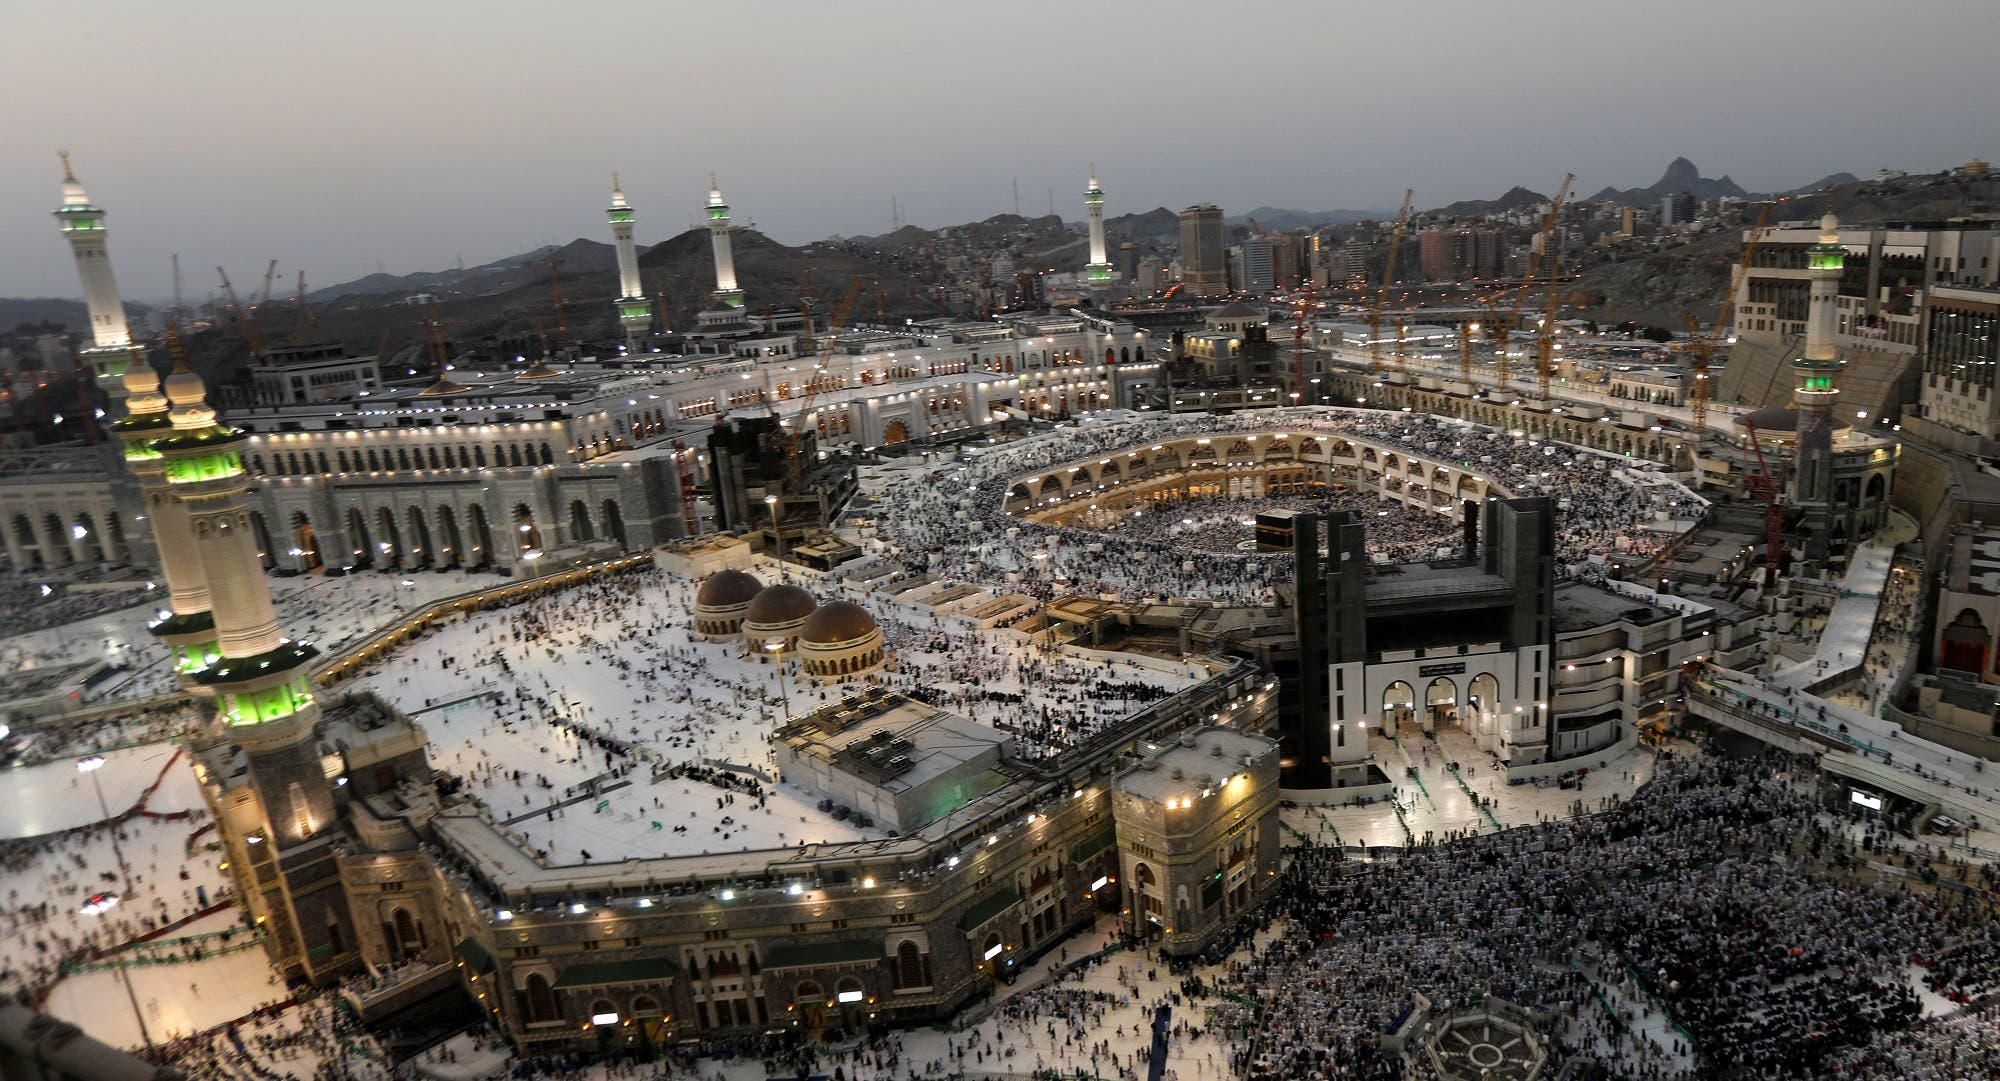 Muslims pray at the Grand mosque during the annual Haj pilgrimage in Mecca, Saudi Arabia September 3, 2017. (Reuters)